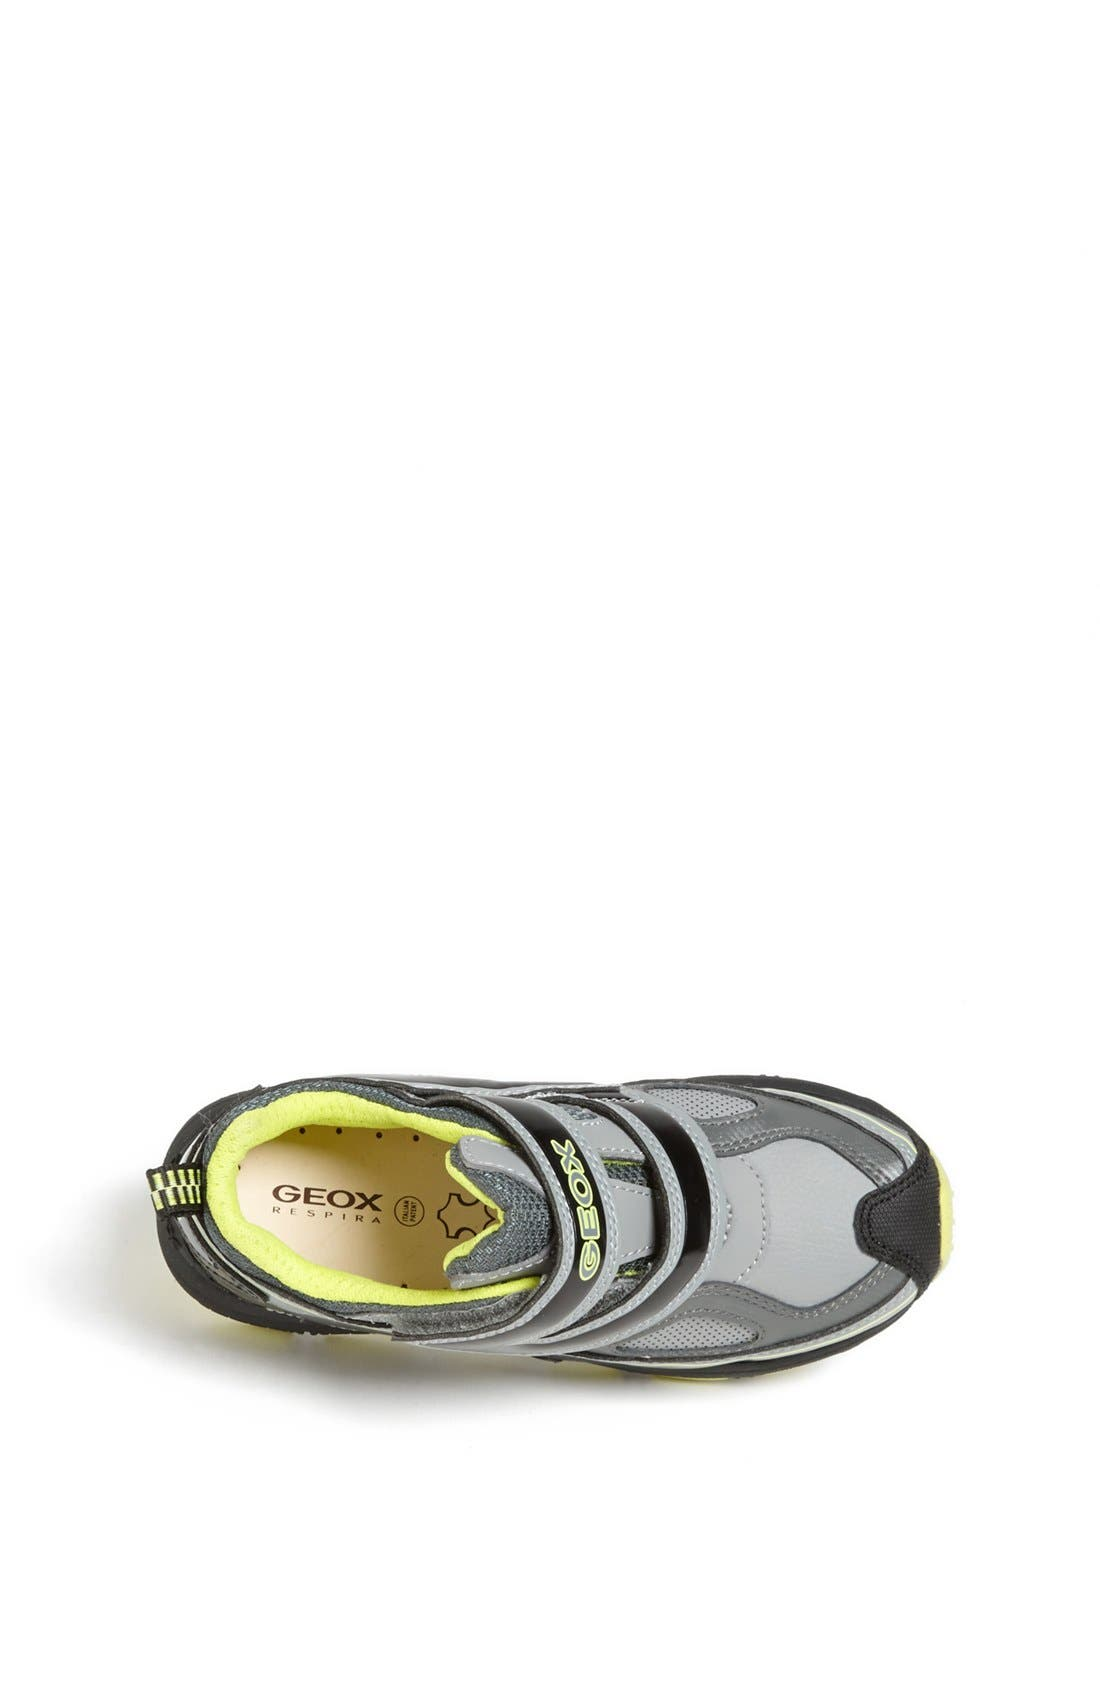 Alternate Image 3  - Geox 'Torque 4' Sneaker (Toddler, Little Kid & Big Kid)